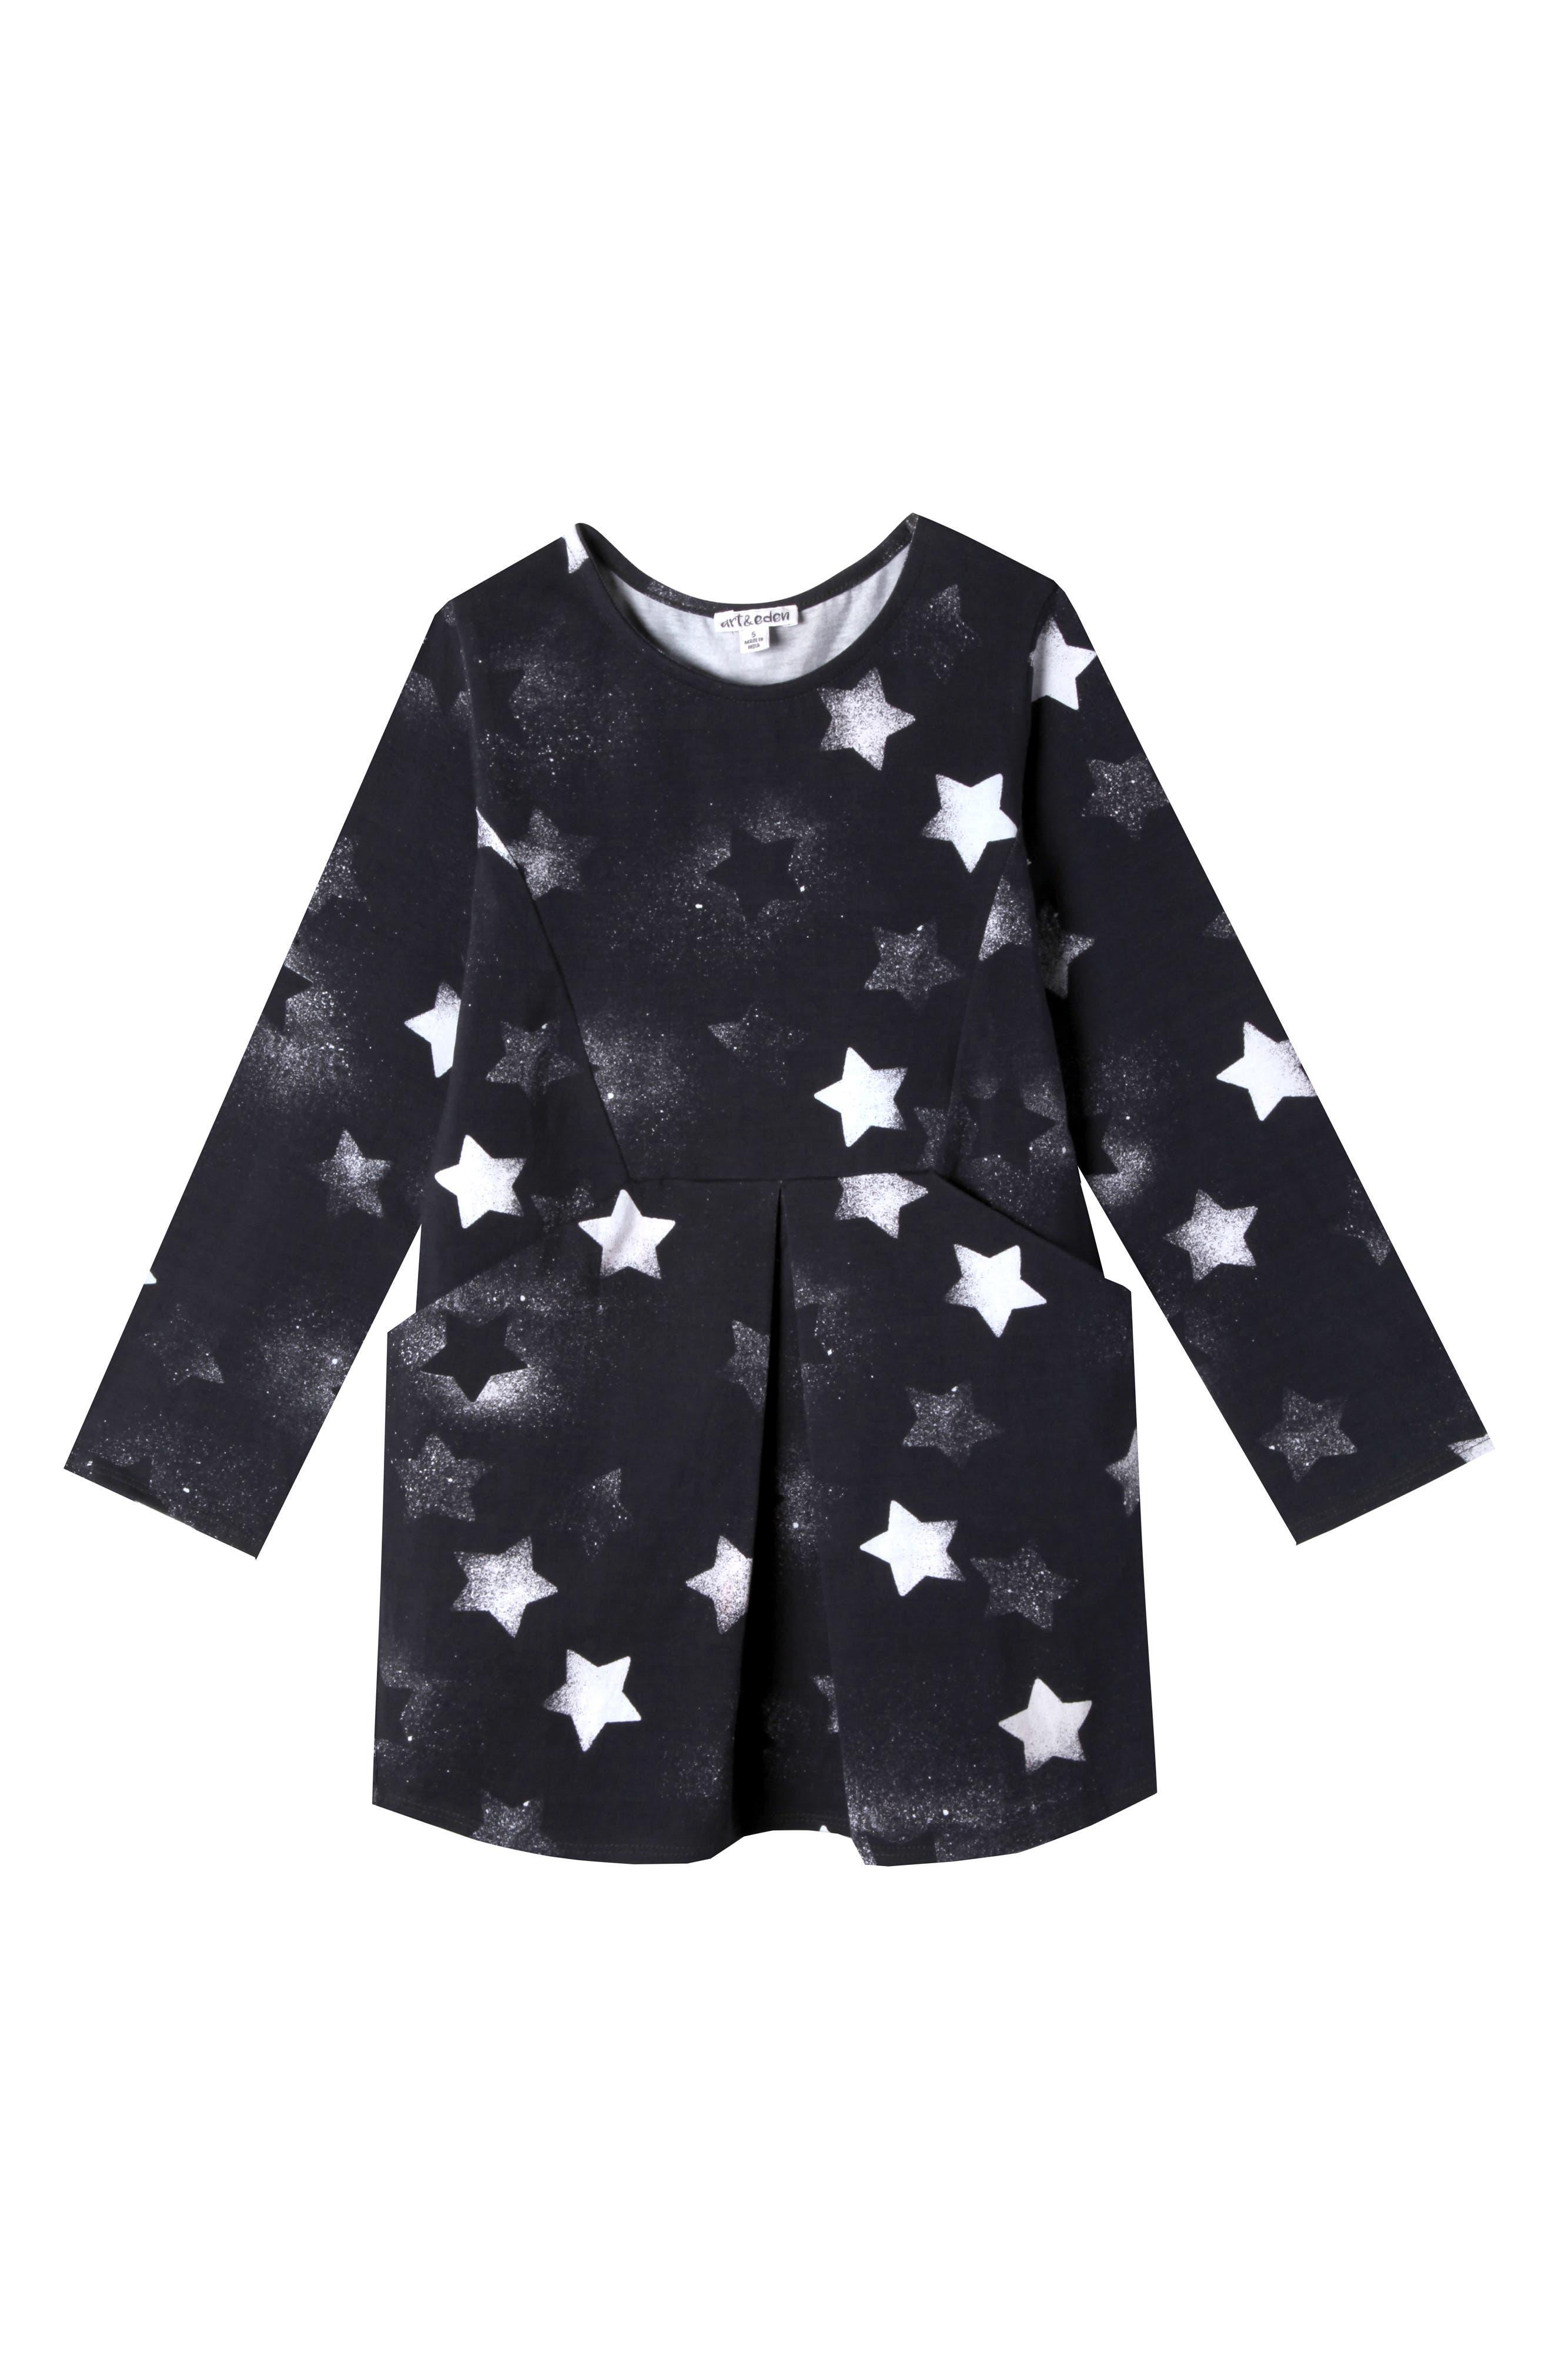 Main Image - Art & Eden Kennedy Star Print Dress (Toddler Girls & Little Girls)